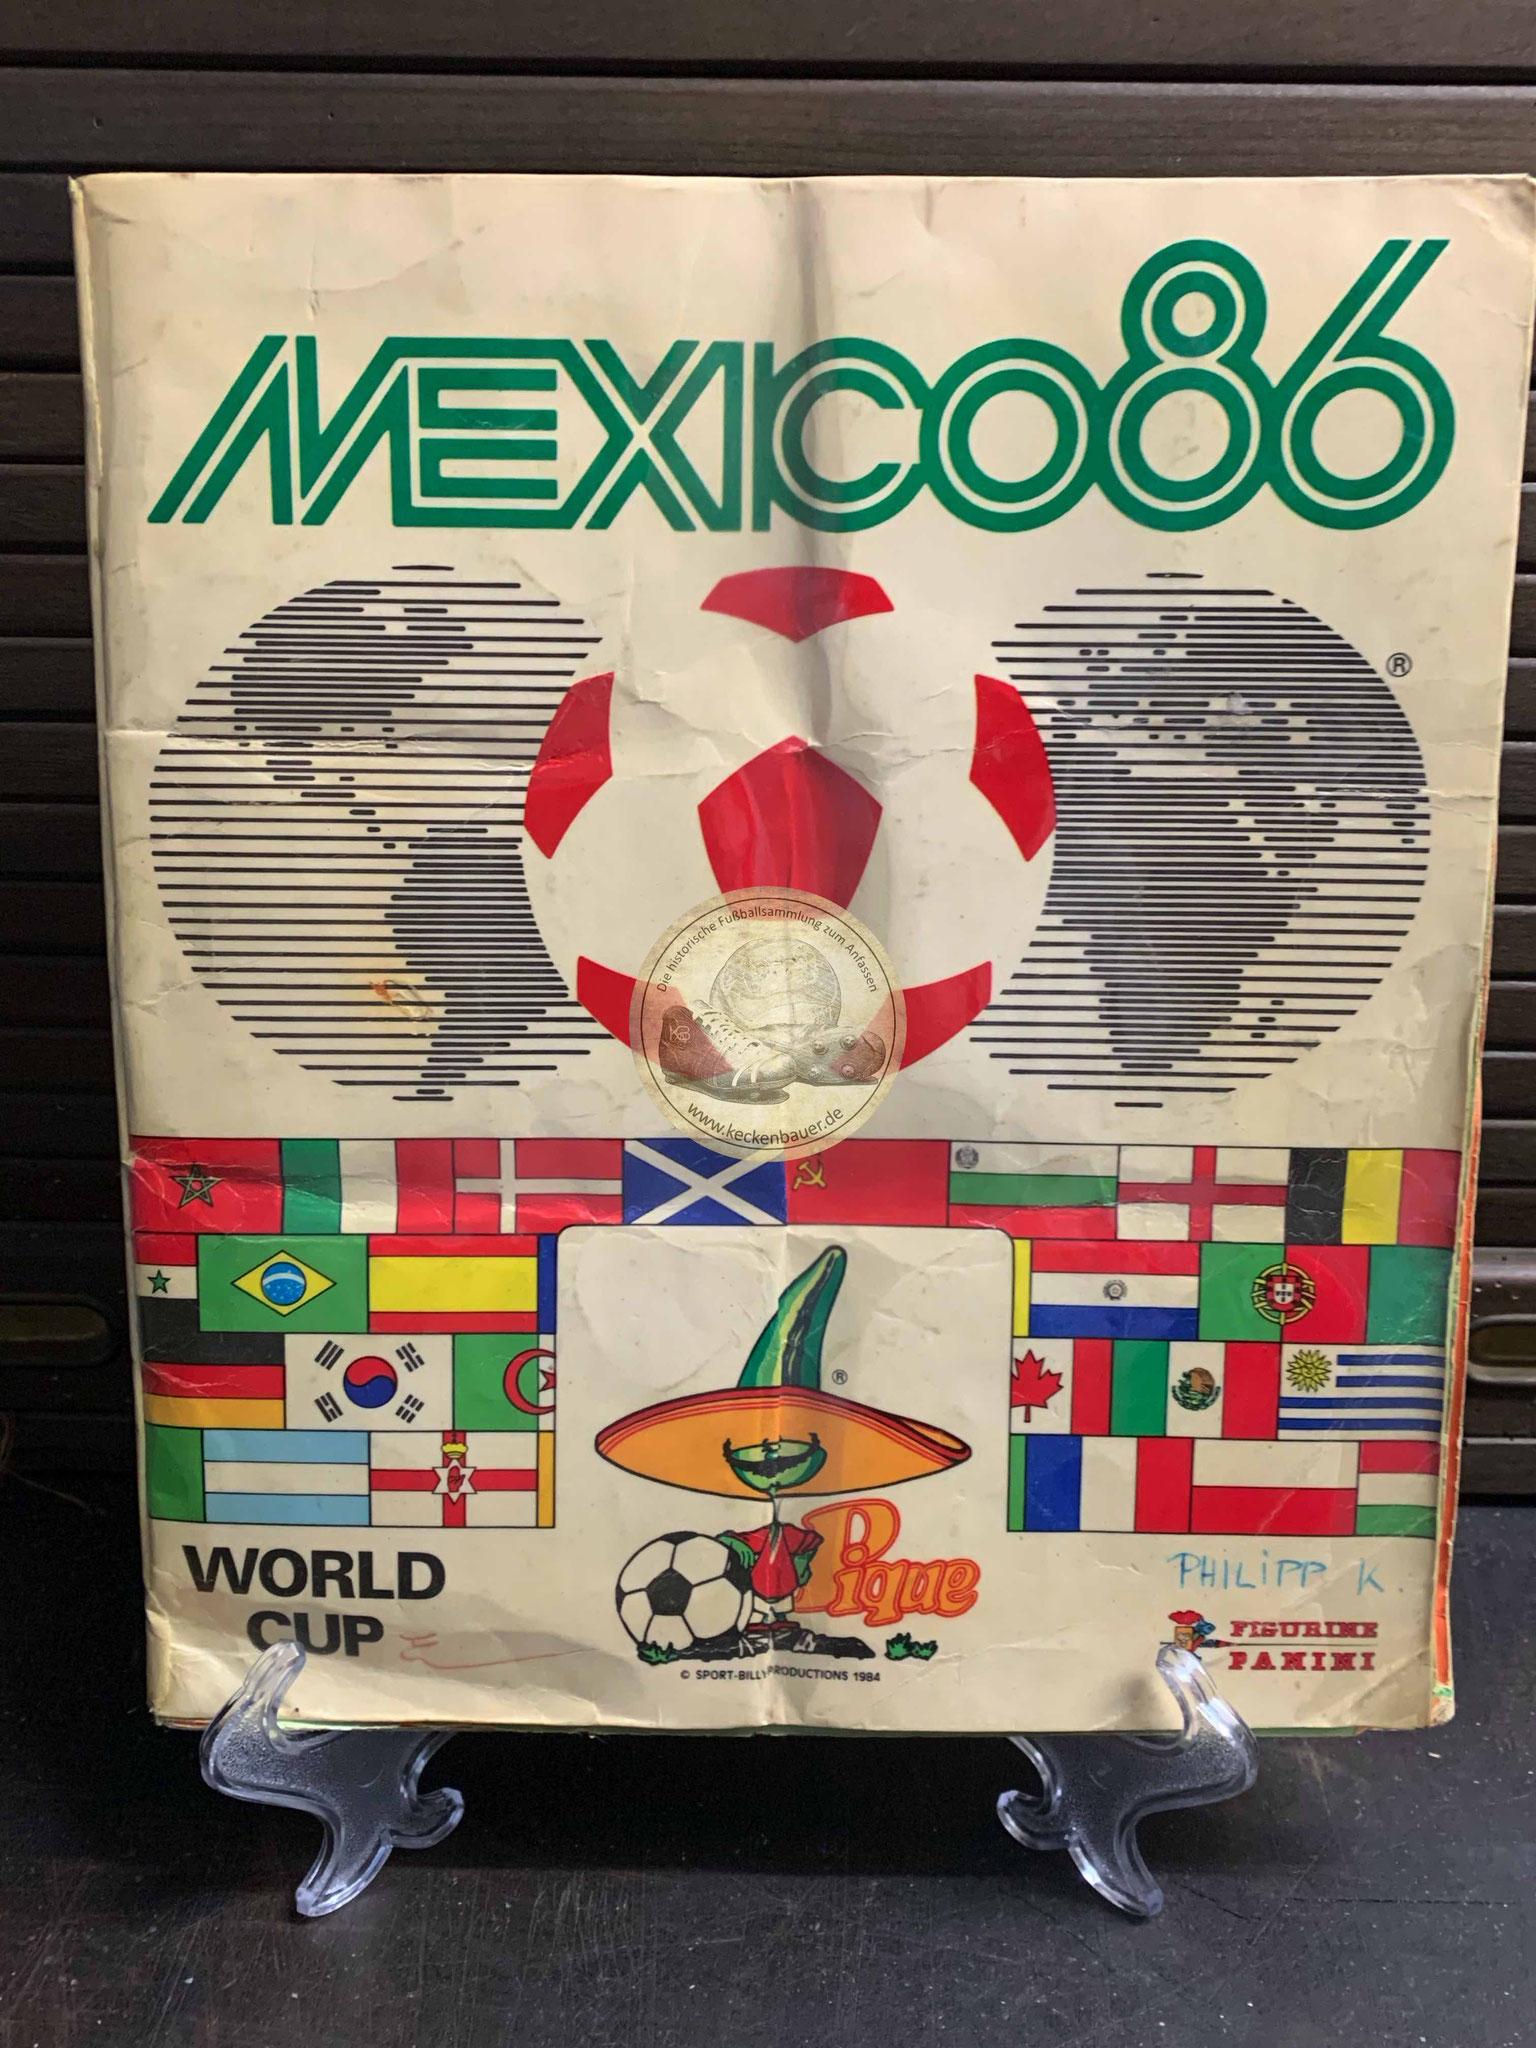 Panini Album von der WM 1986 in Mexico